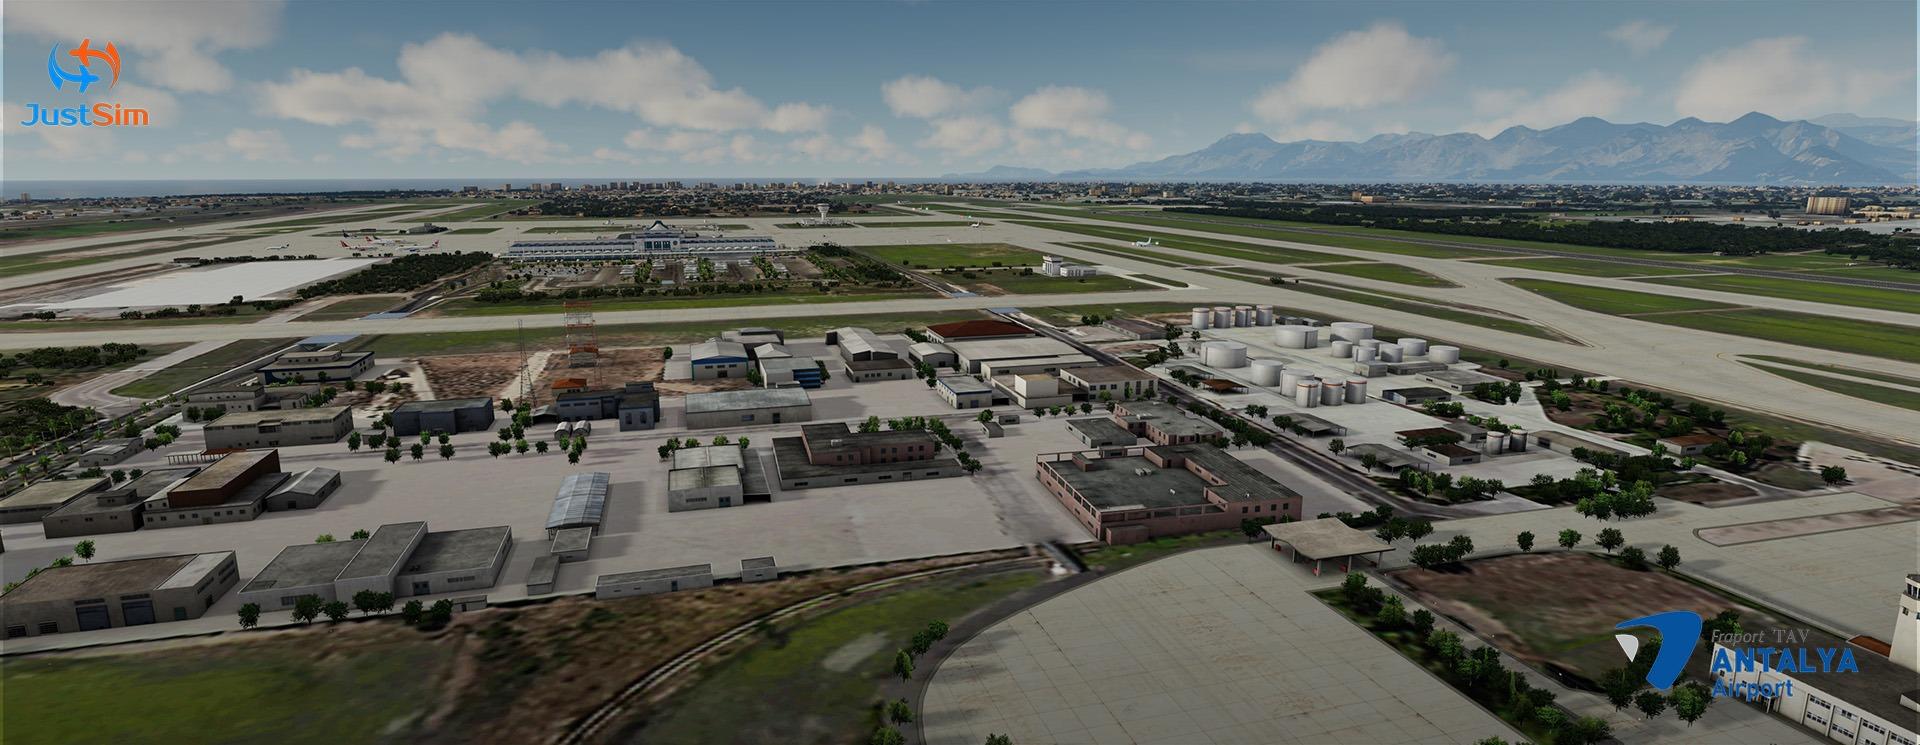 235632_25-06-2020_11-32-55 JustSim Releases Antalya International Airport V2